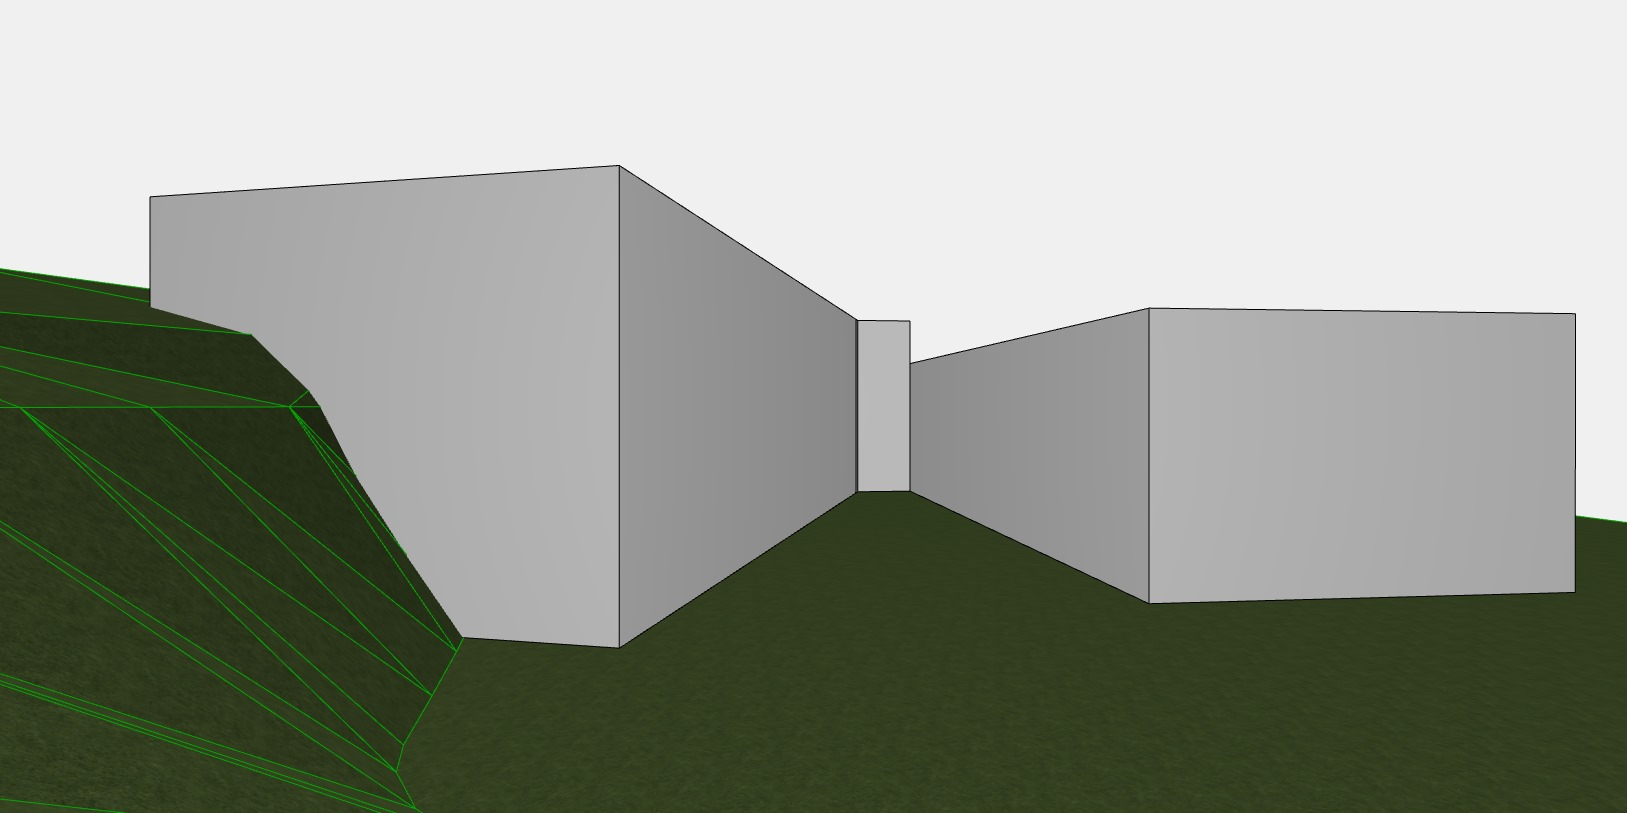 obrigheim schwetlick bautr gergesellschaft offenburg. Black Bedroom Furniture Sets. Home Design Ideas